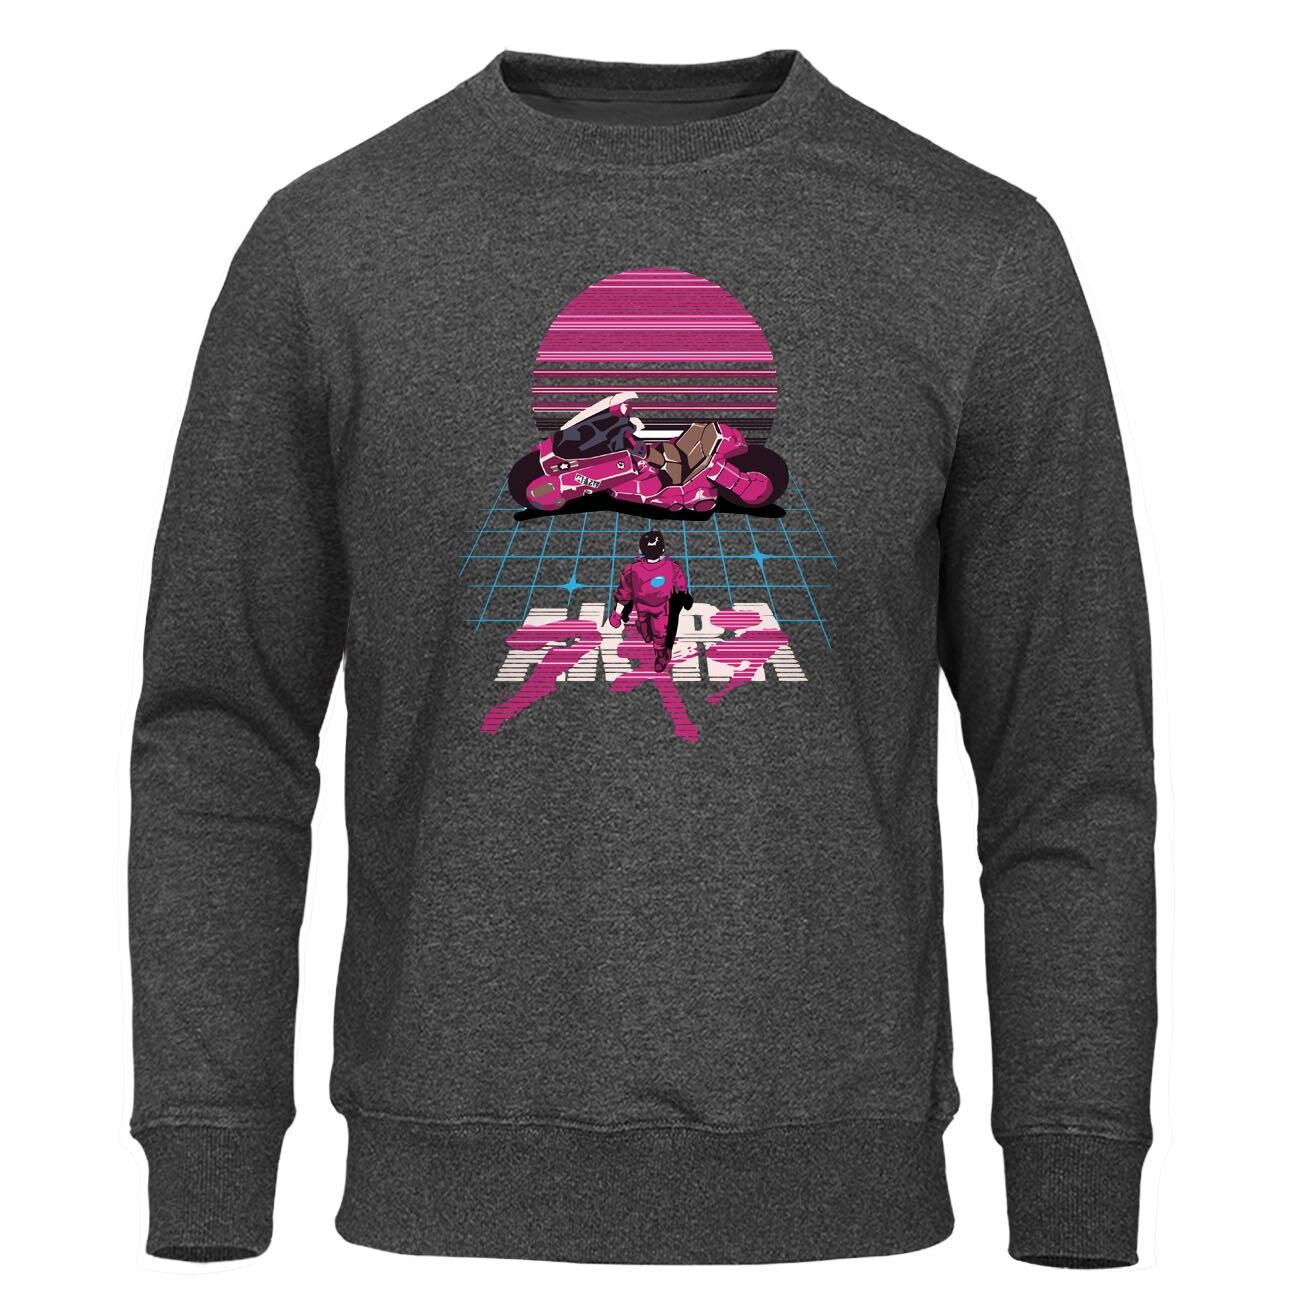 Akira Synthwave Sweatshirt Japanese Anime Hoodies Men Fashion Print Hoodie Casual Male Comfortable Sweatshirts Autumn Pullover